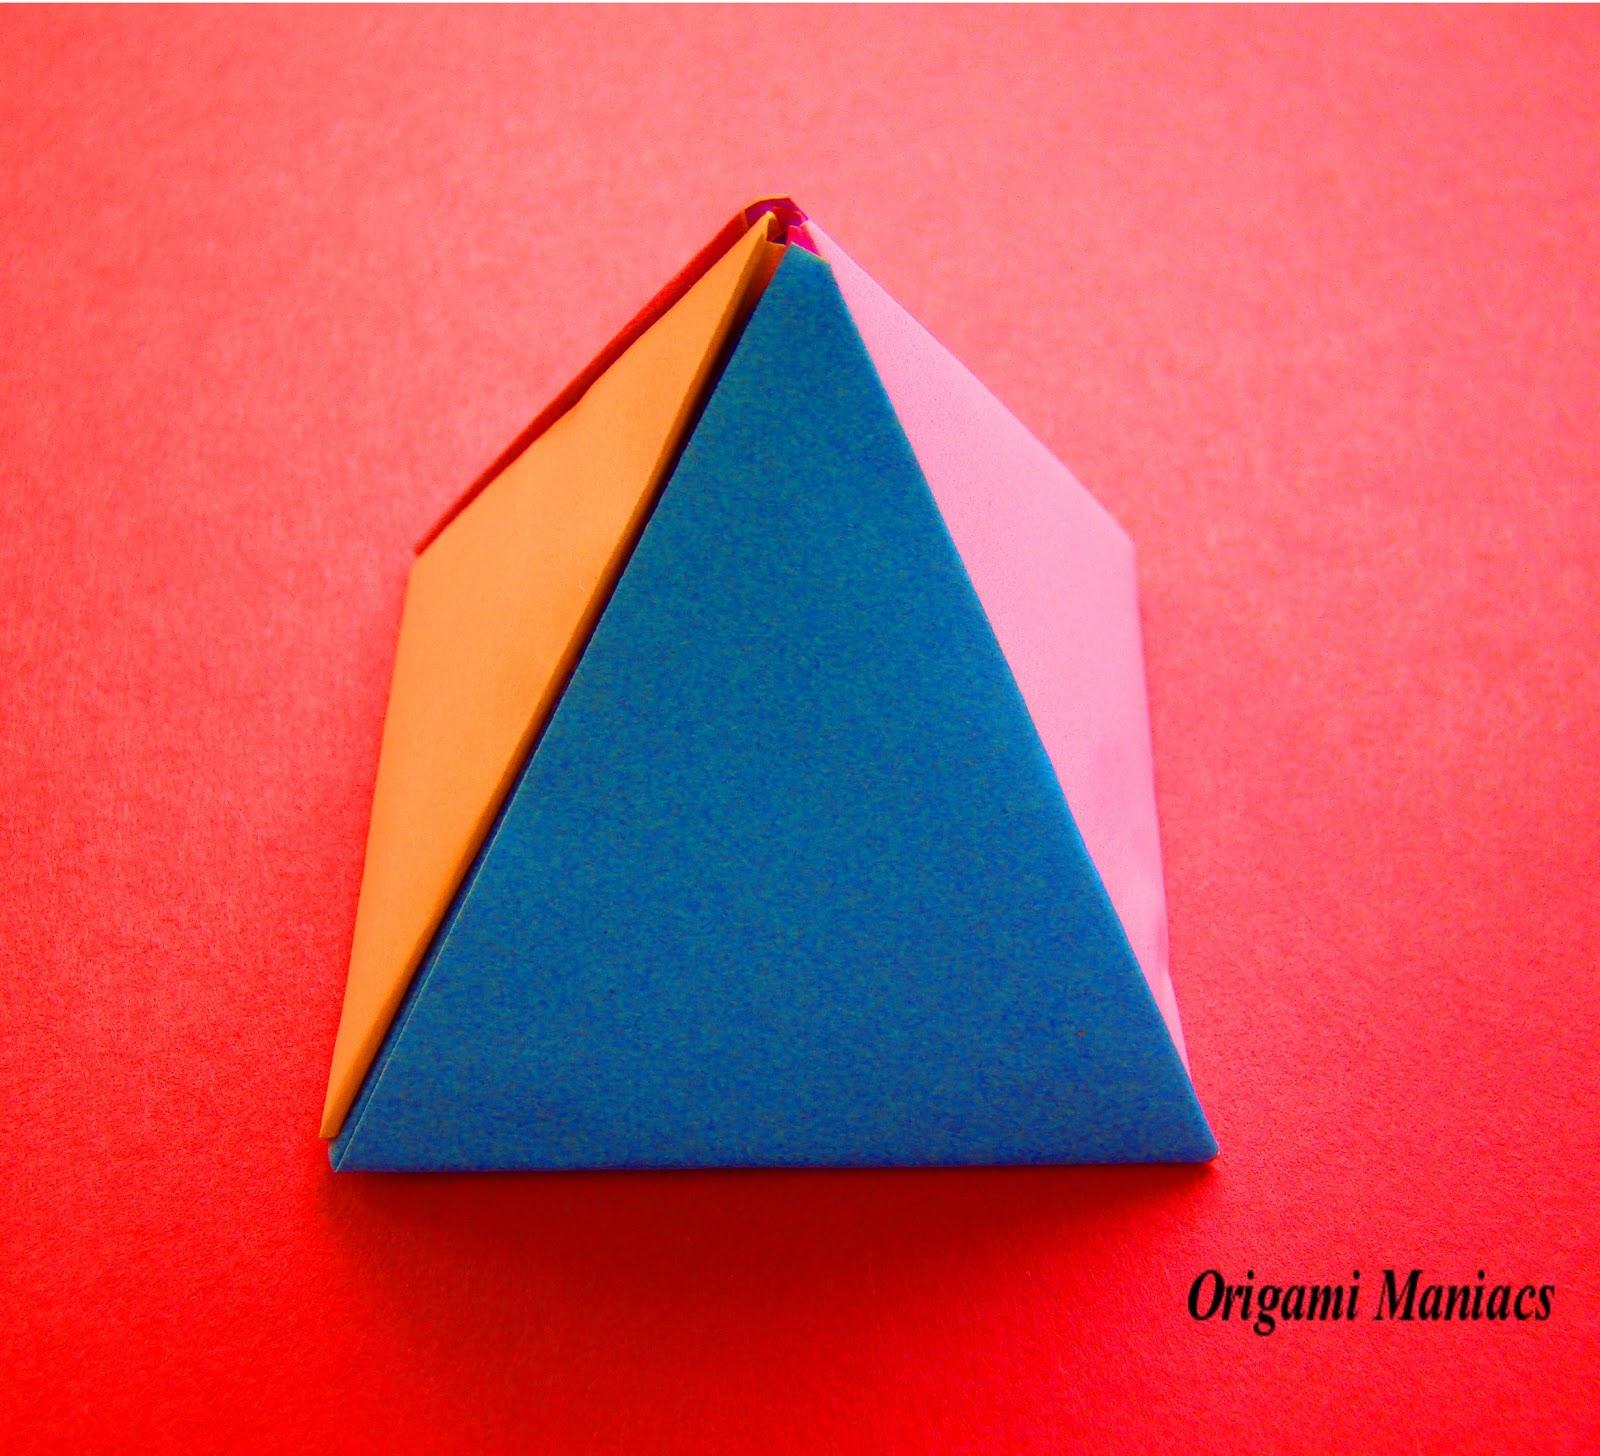 origami maniacs origami pyramids. Black Bedroom Furniture Sets. Home Design Ideas